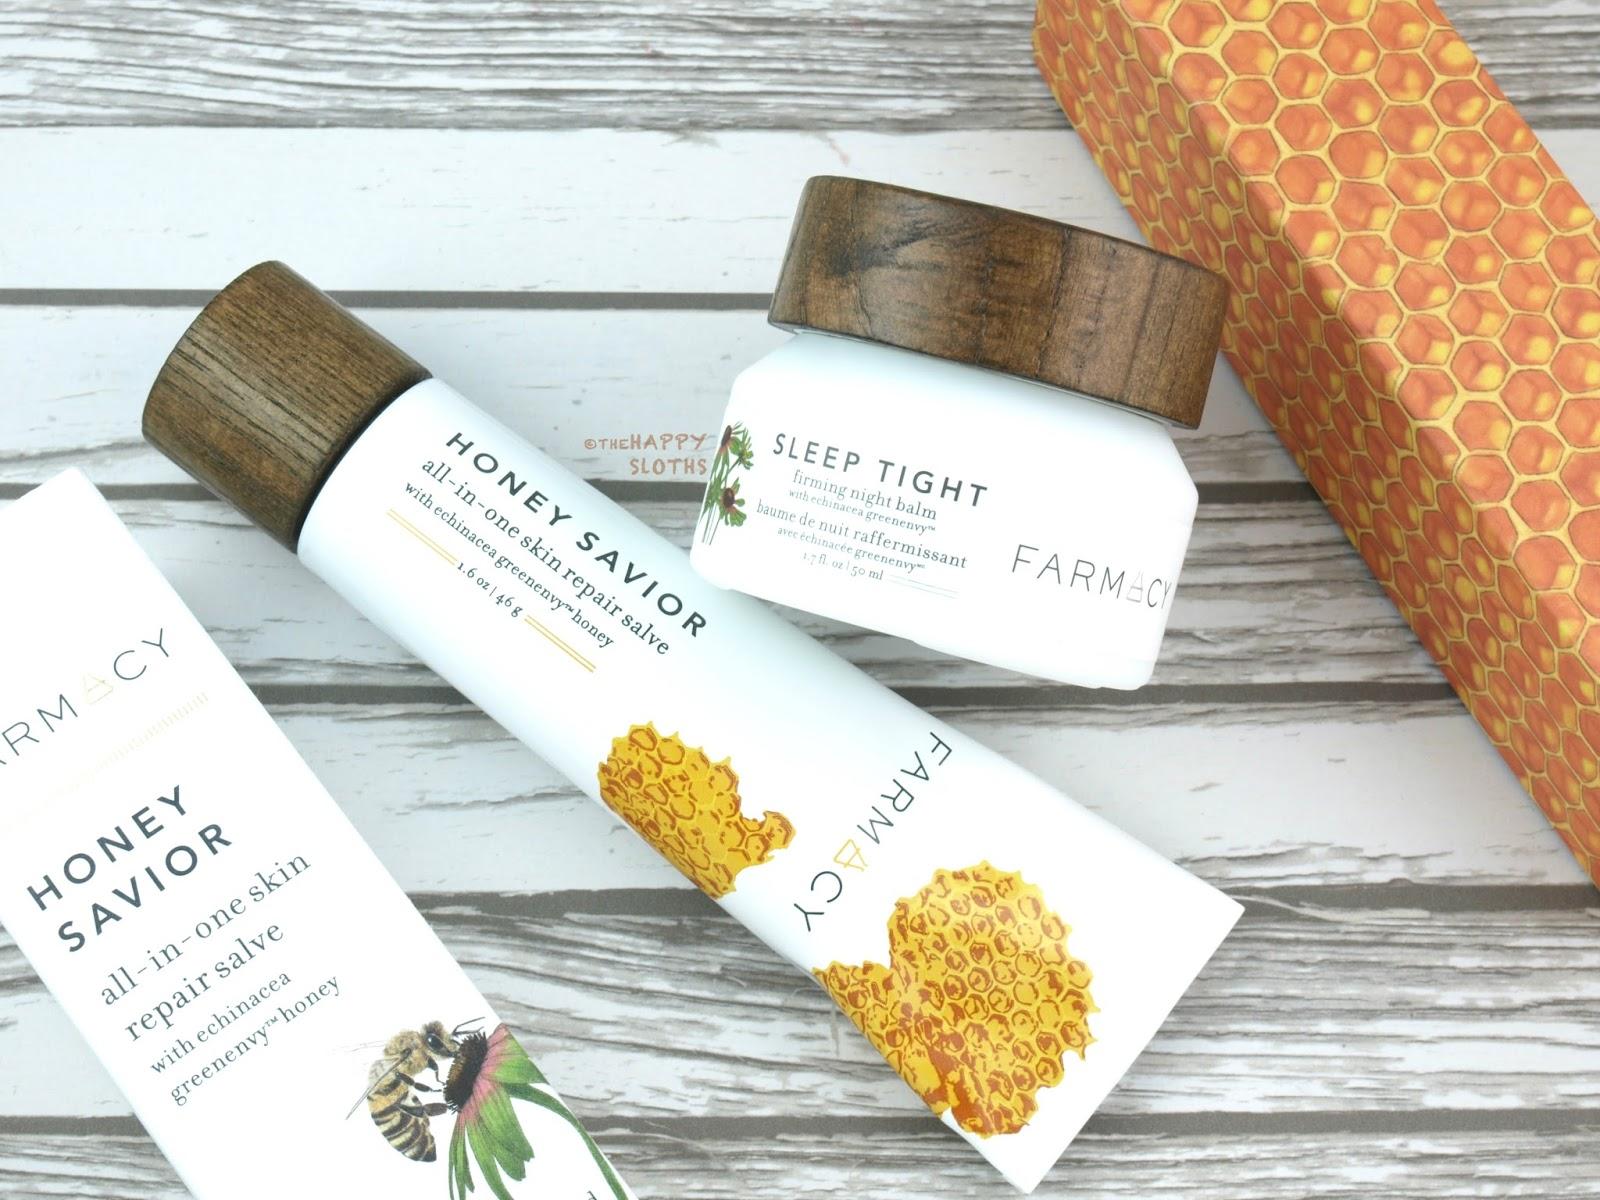 Farmacy Sleep Tight Firming Night Balm & Honey Savior All-In-One Skin Repair Salve: Review